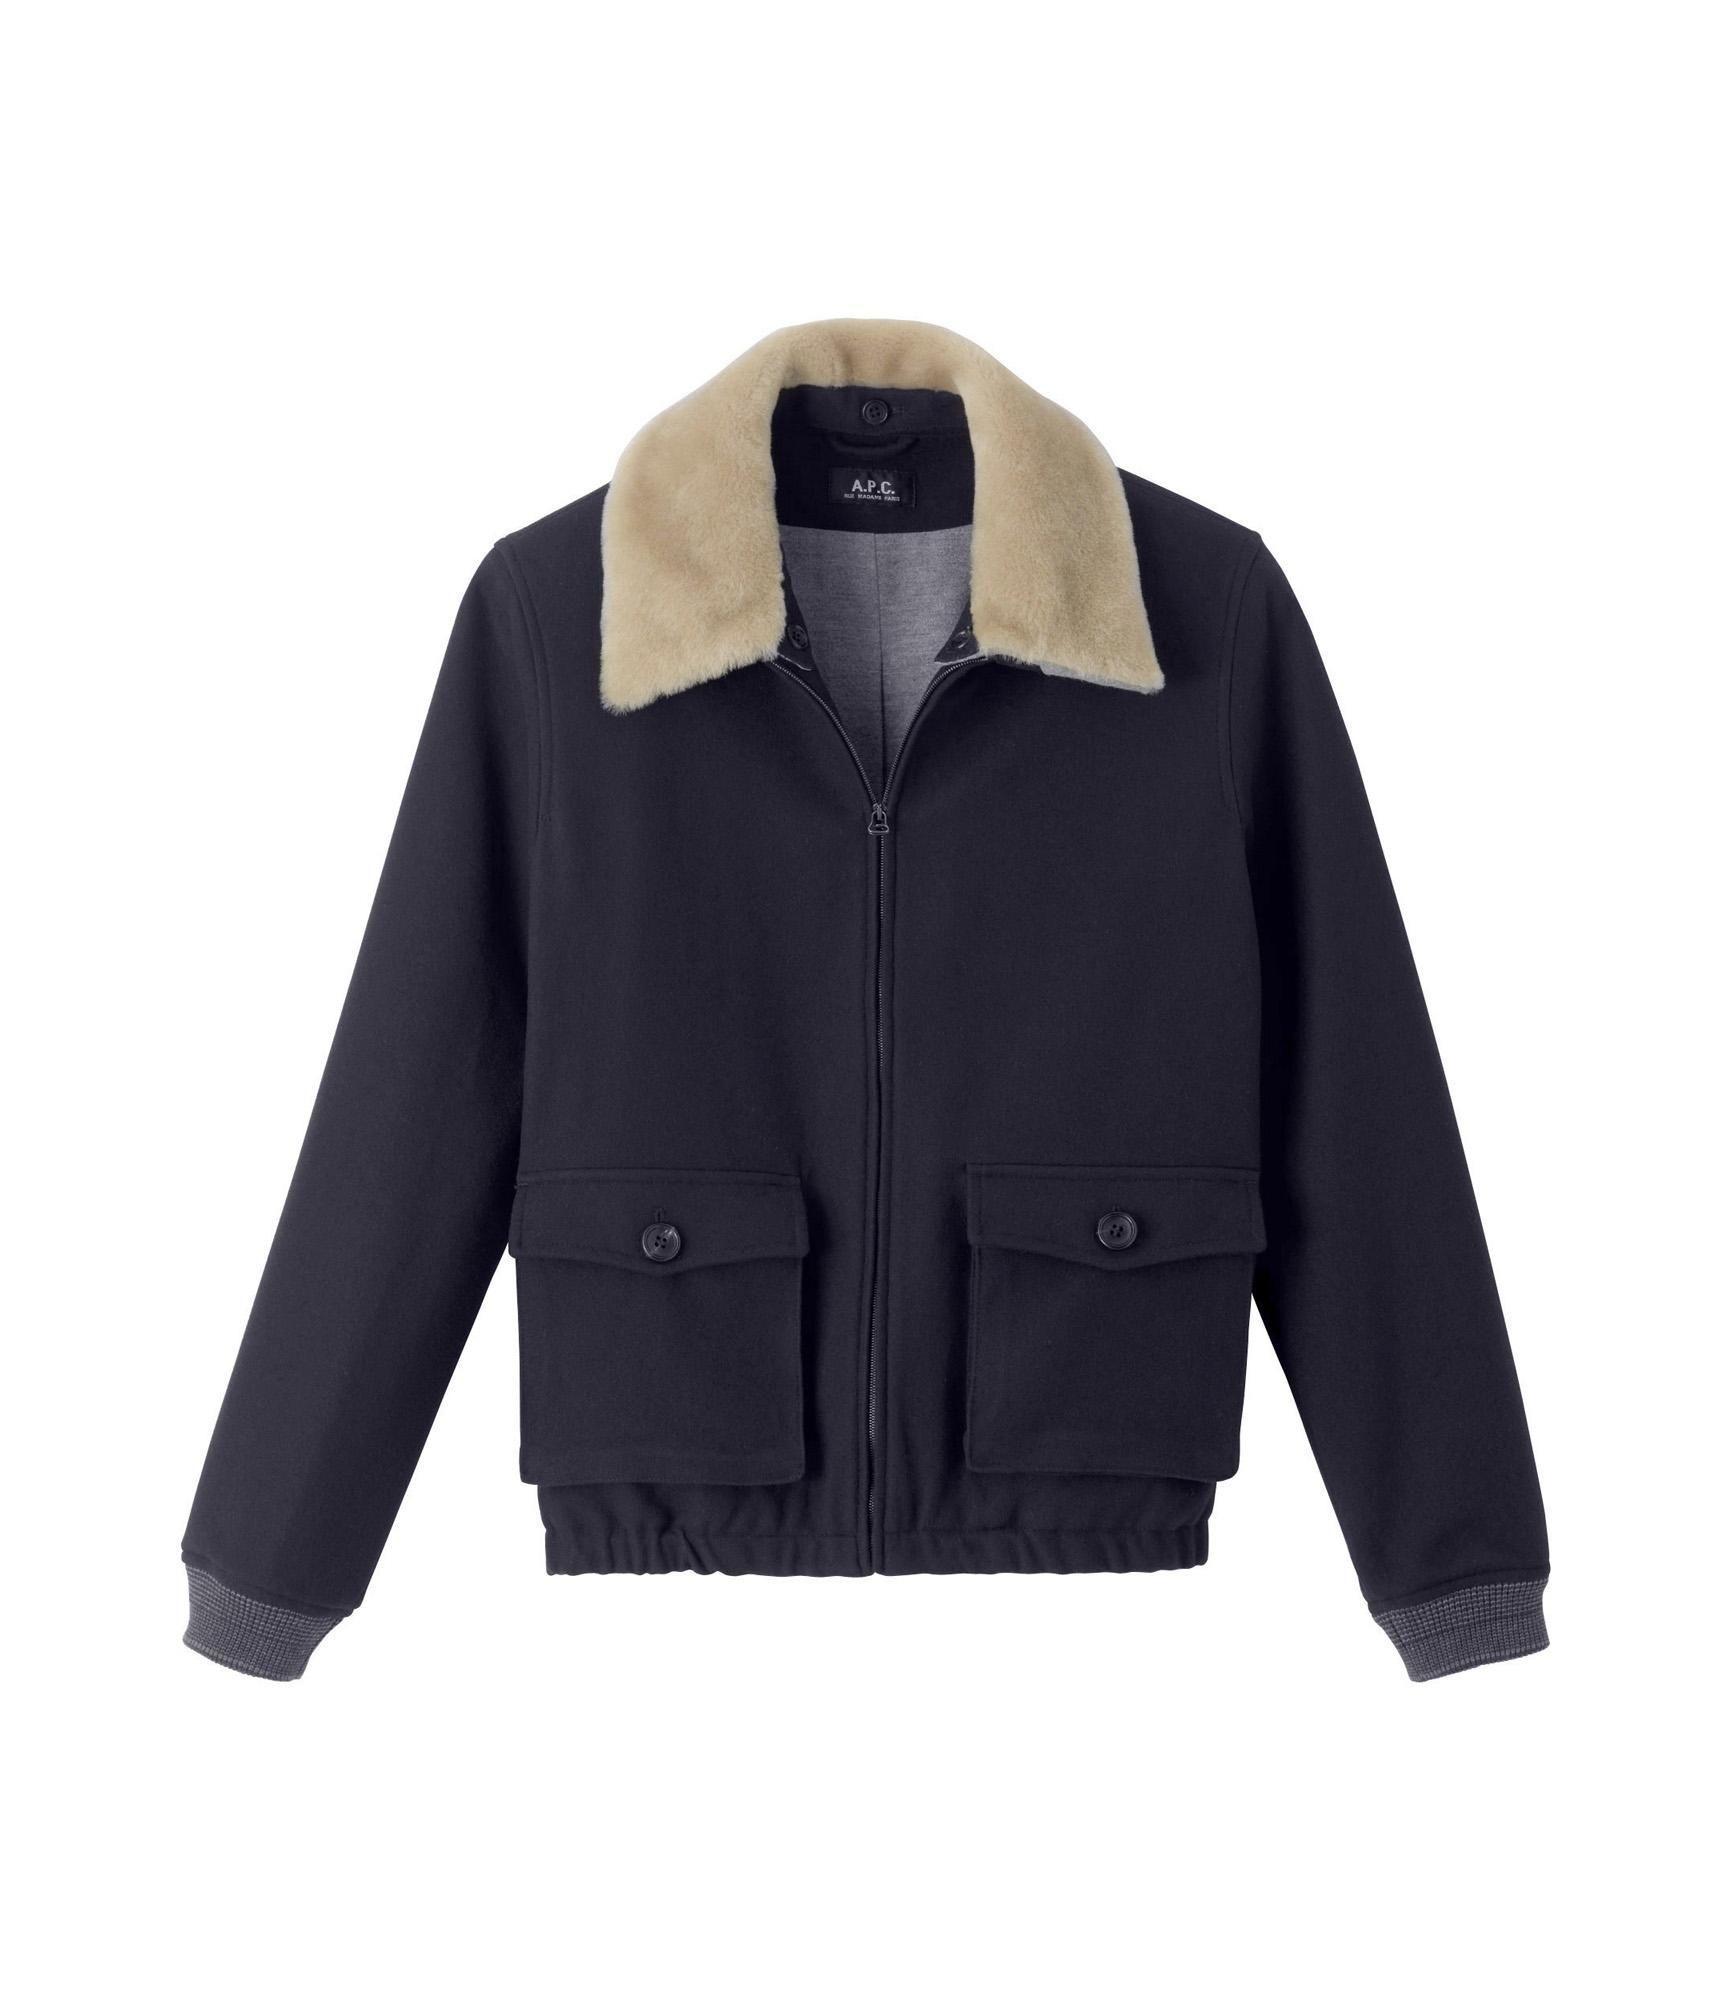 Felted Aviator Jacket Navy Blue A P C Men Mens Blazer Jacket Leather Jacket Black Casual Jacket [ 2000 x 1732 Pixel ]